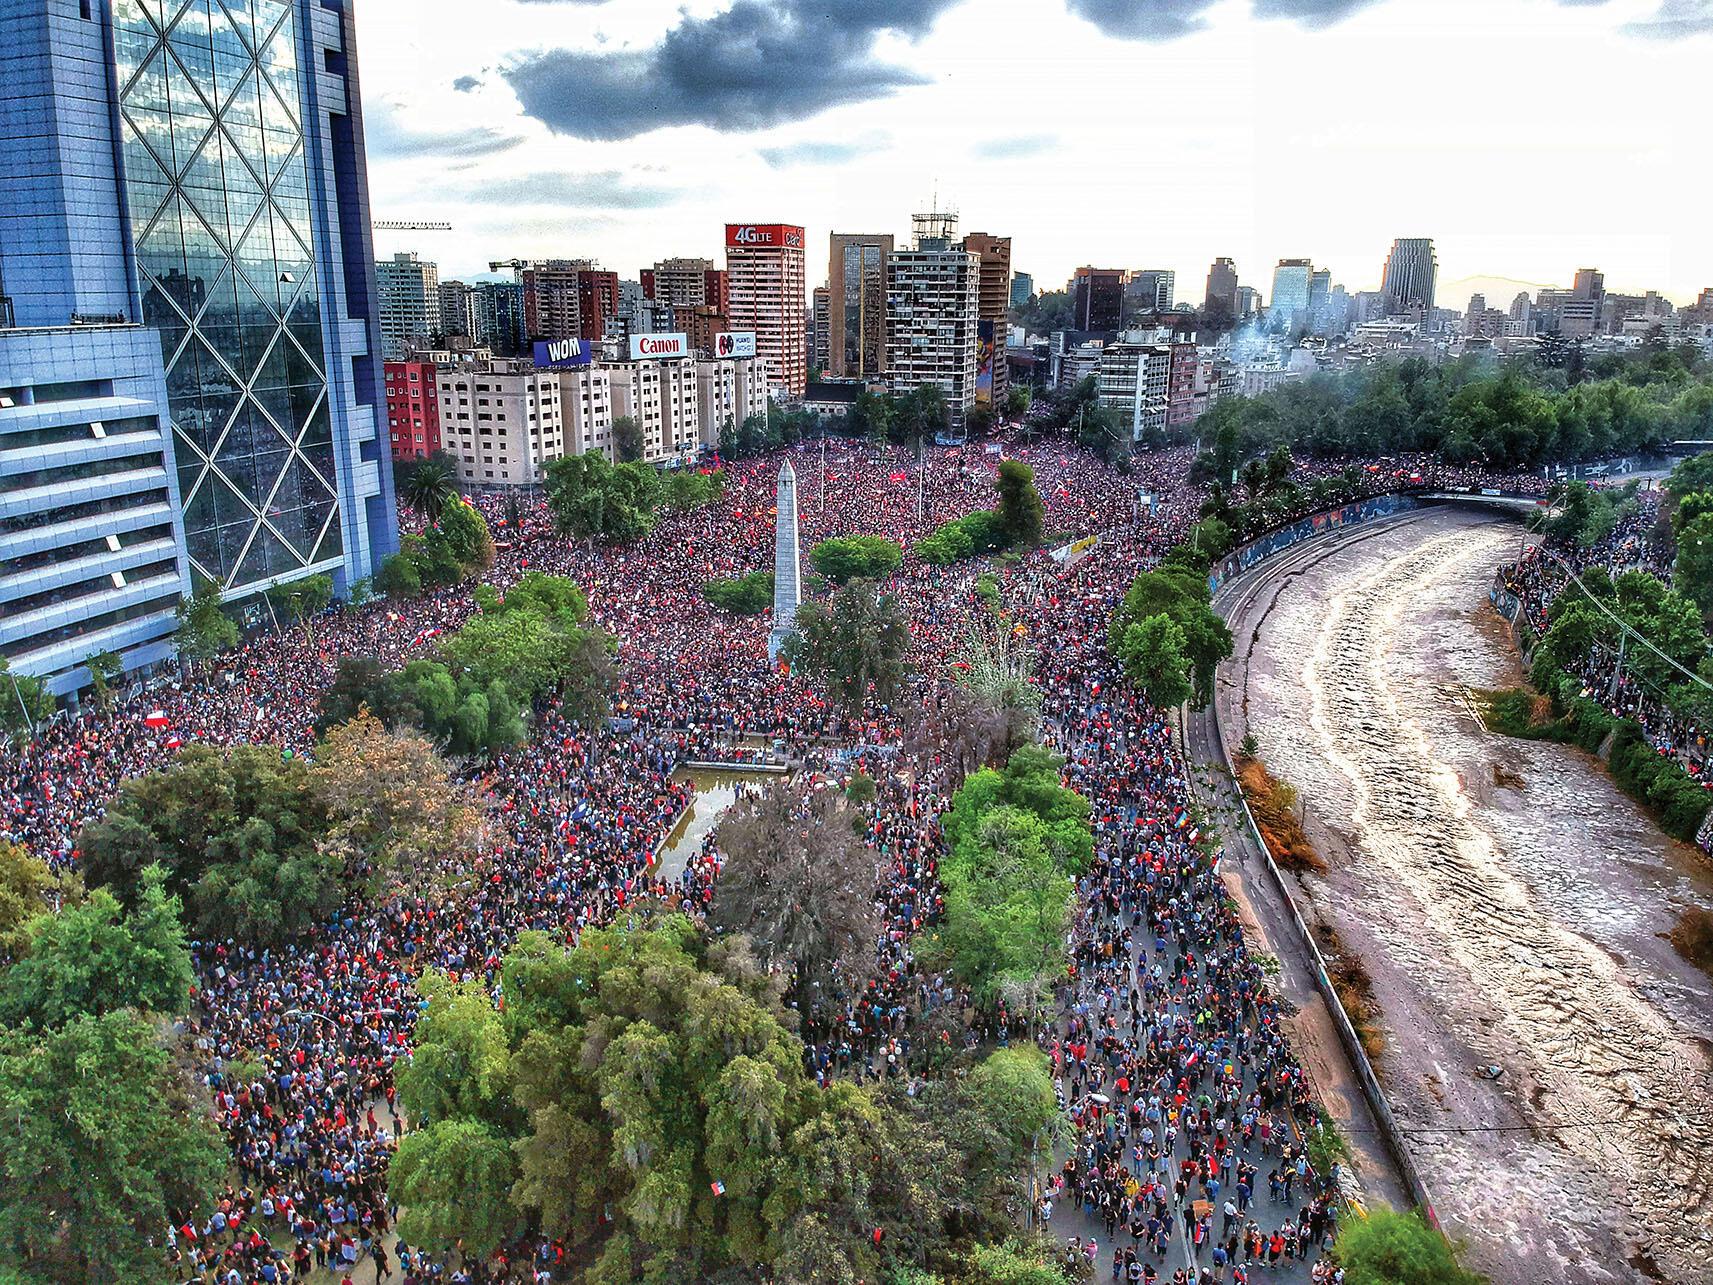 A huge protest in Santiago's Plaza Baquedano, October 2019. (Photo by Hugo Morales.)